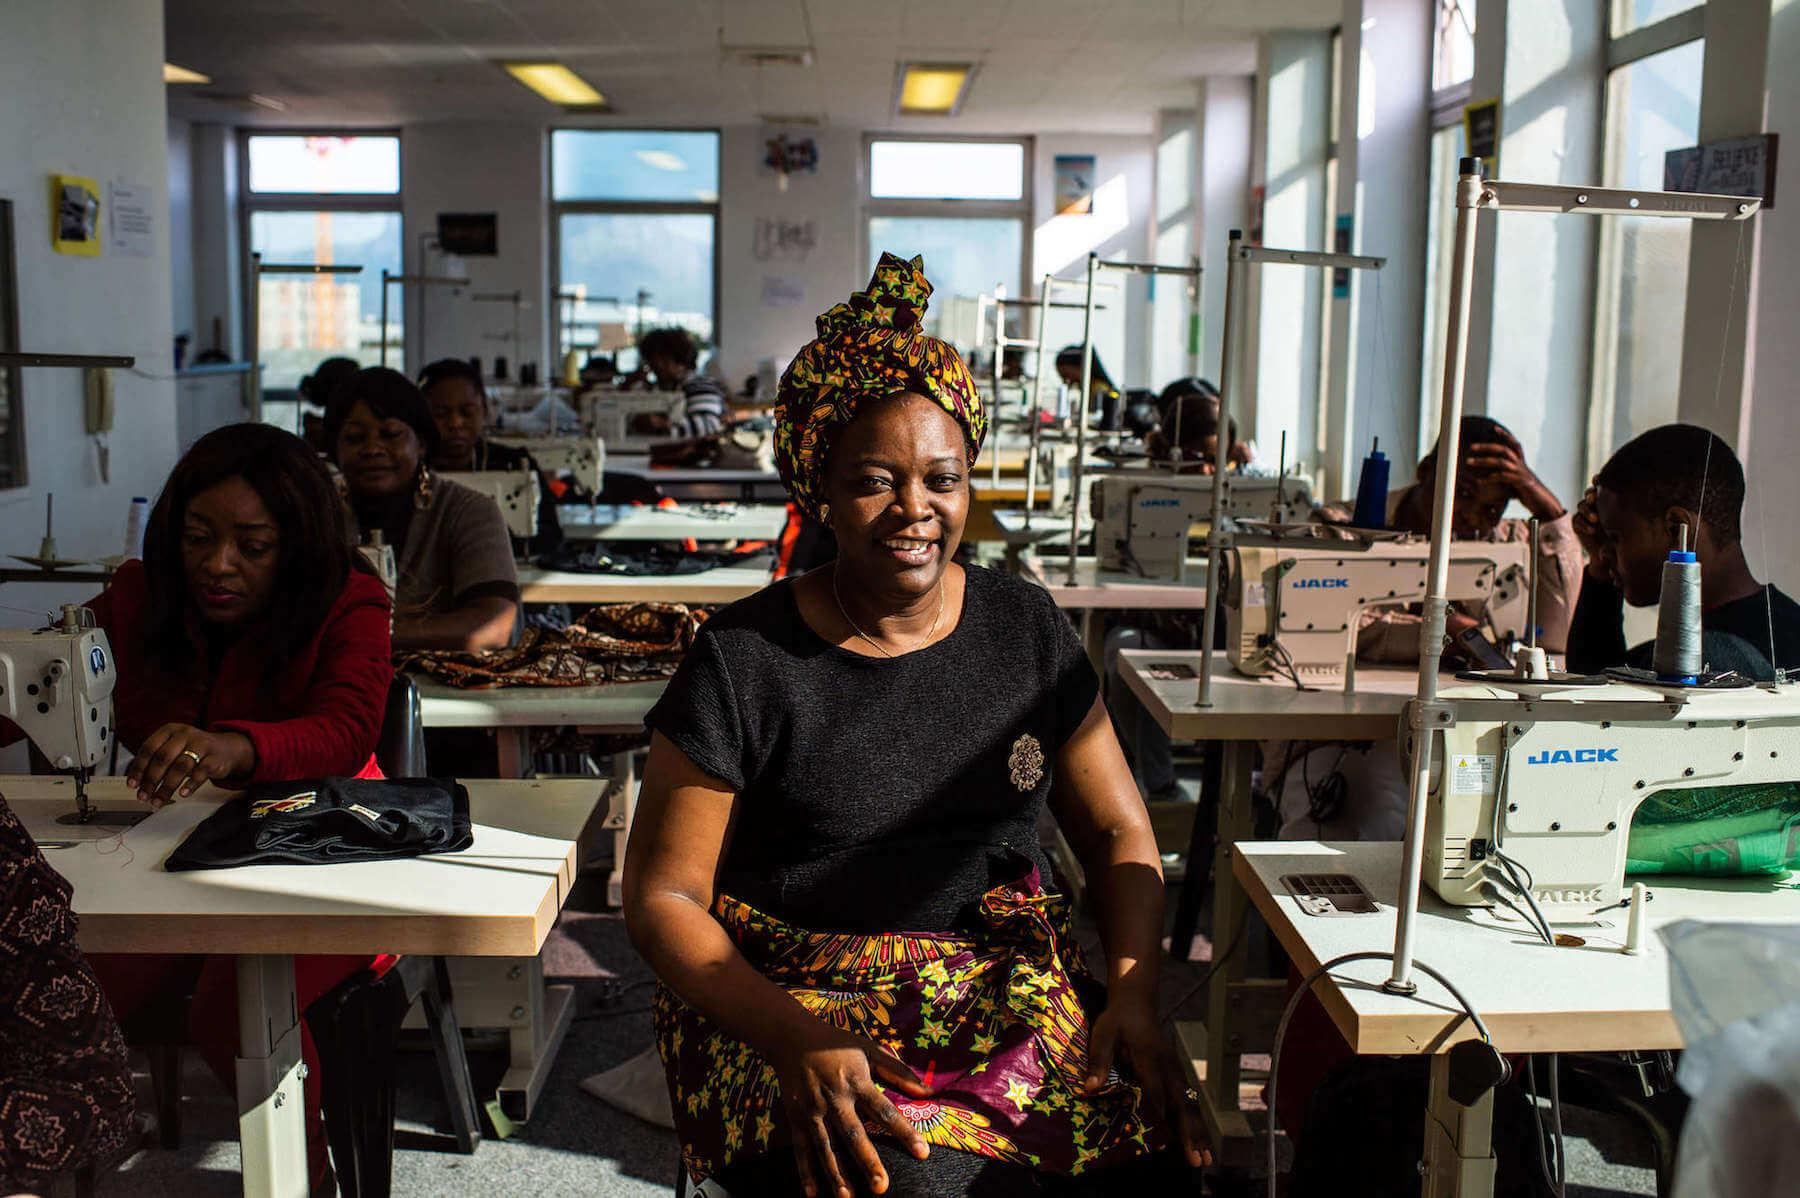 Kwesu Founder Patricia Mudiayi